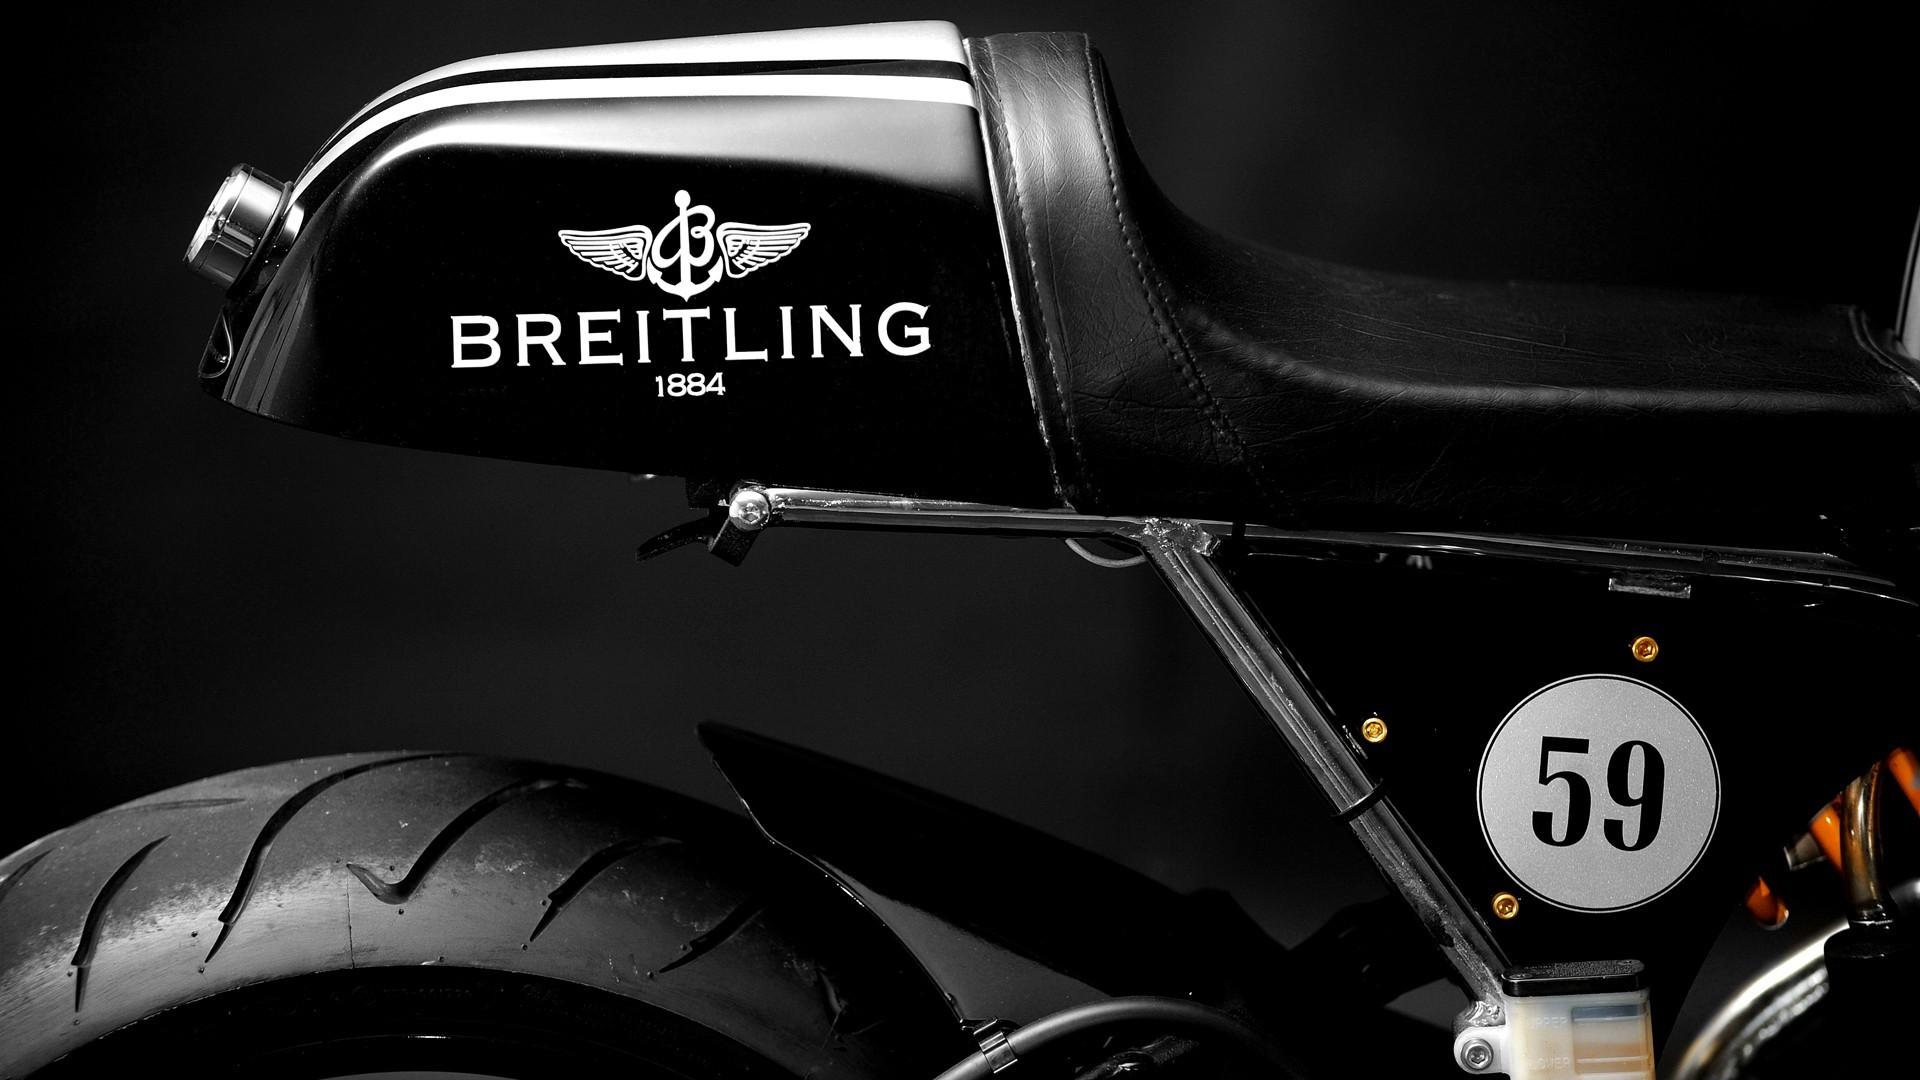 Black Breitling motorbikes motorcycles cafe racer wallpaper      206364   WallpaperUP